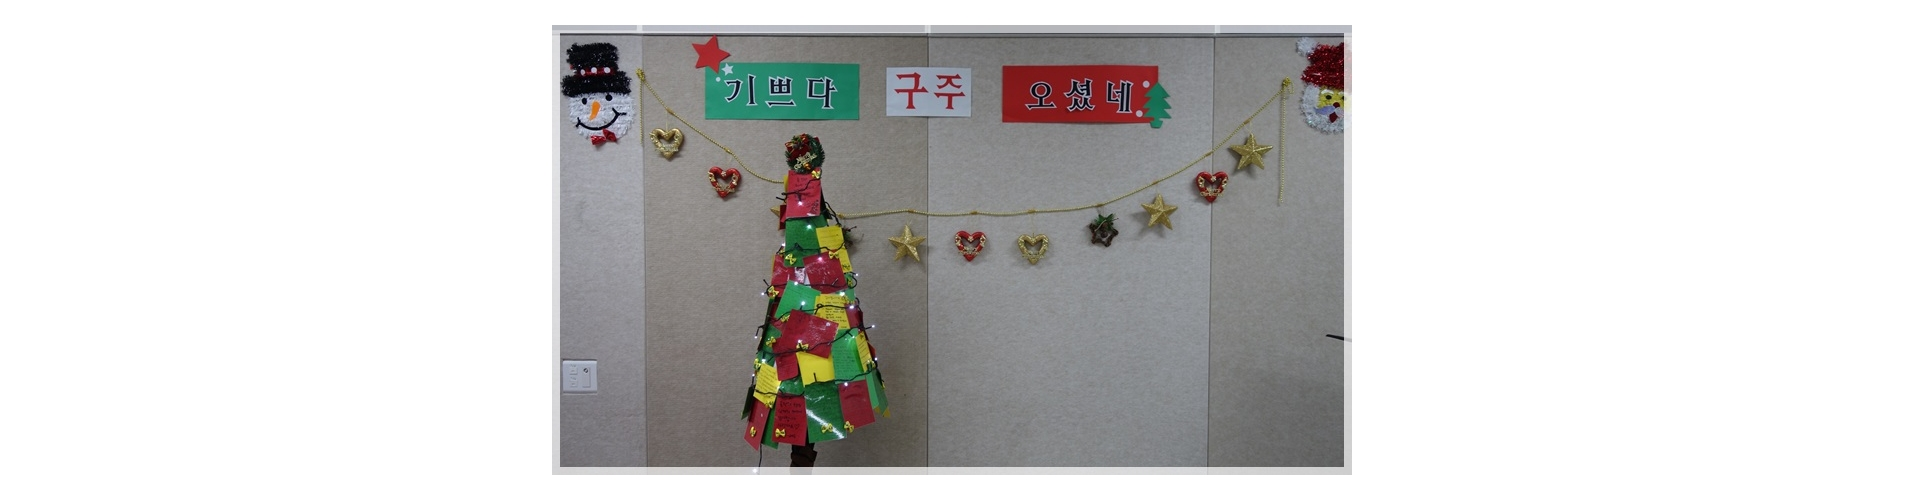 2014-12-19 종강식 및 종강파티